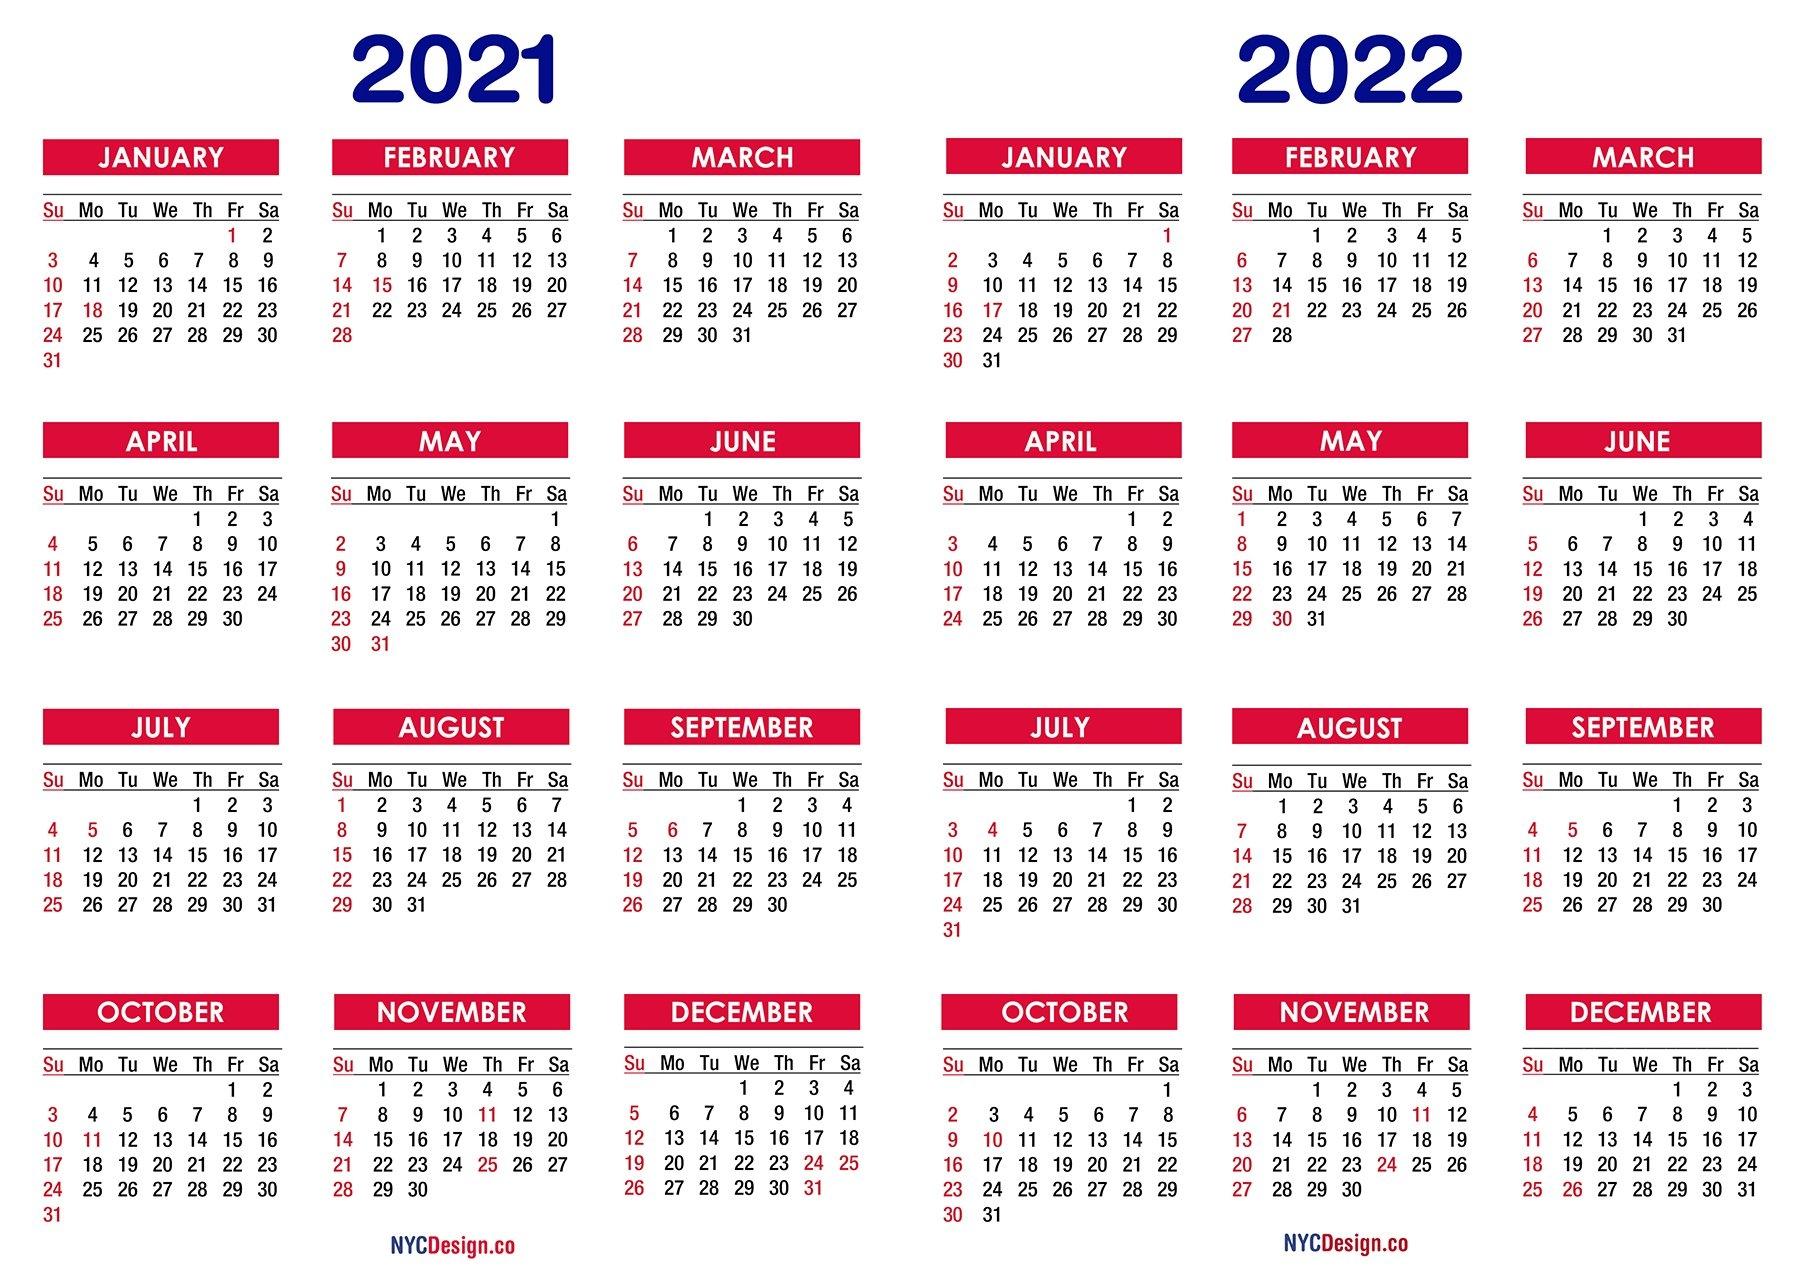 2021 - 2022 Two Year Calendar With Holidays, Printable Free - Nycdesign.co | Calendars Printable inside 3 Year Printable Calendar 2021 2021 2022